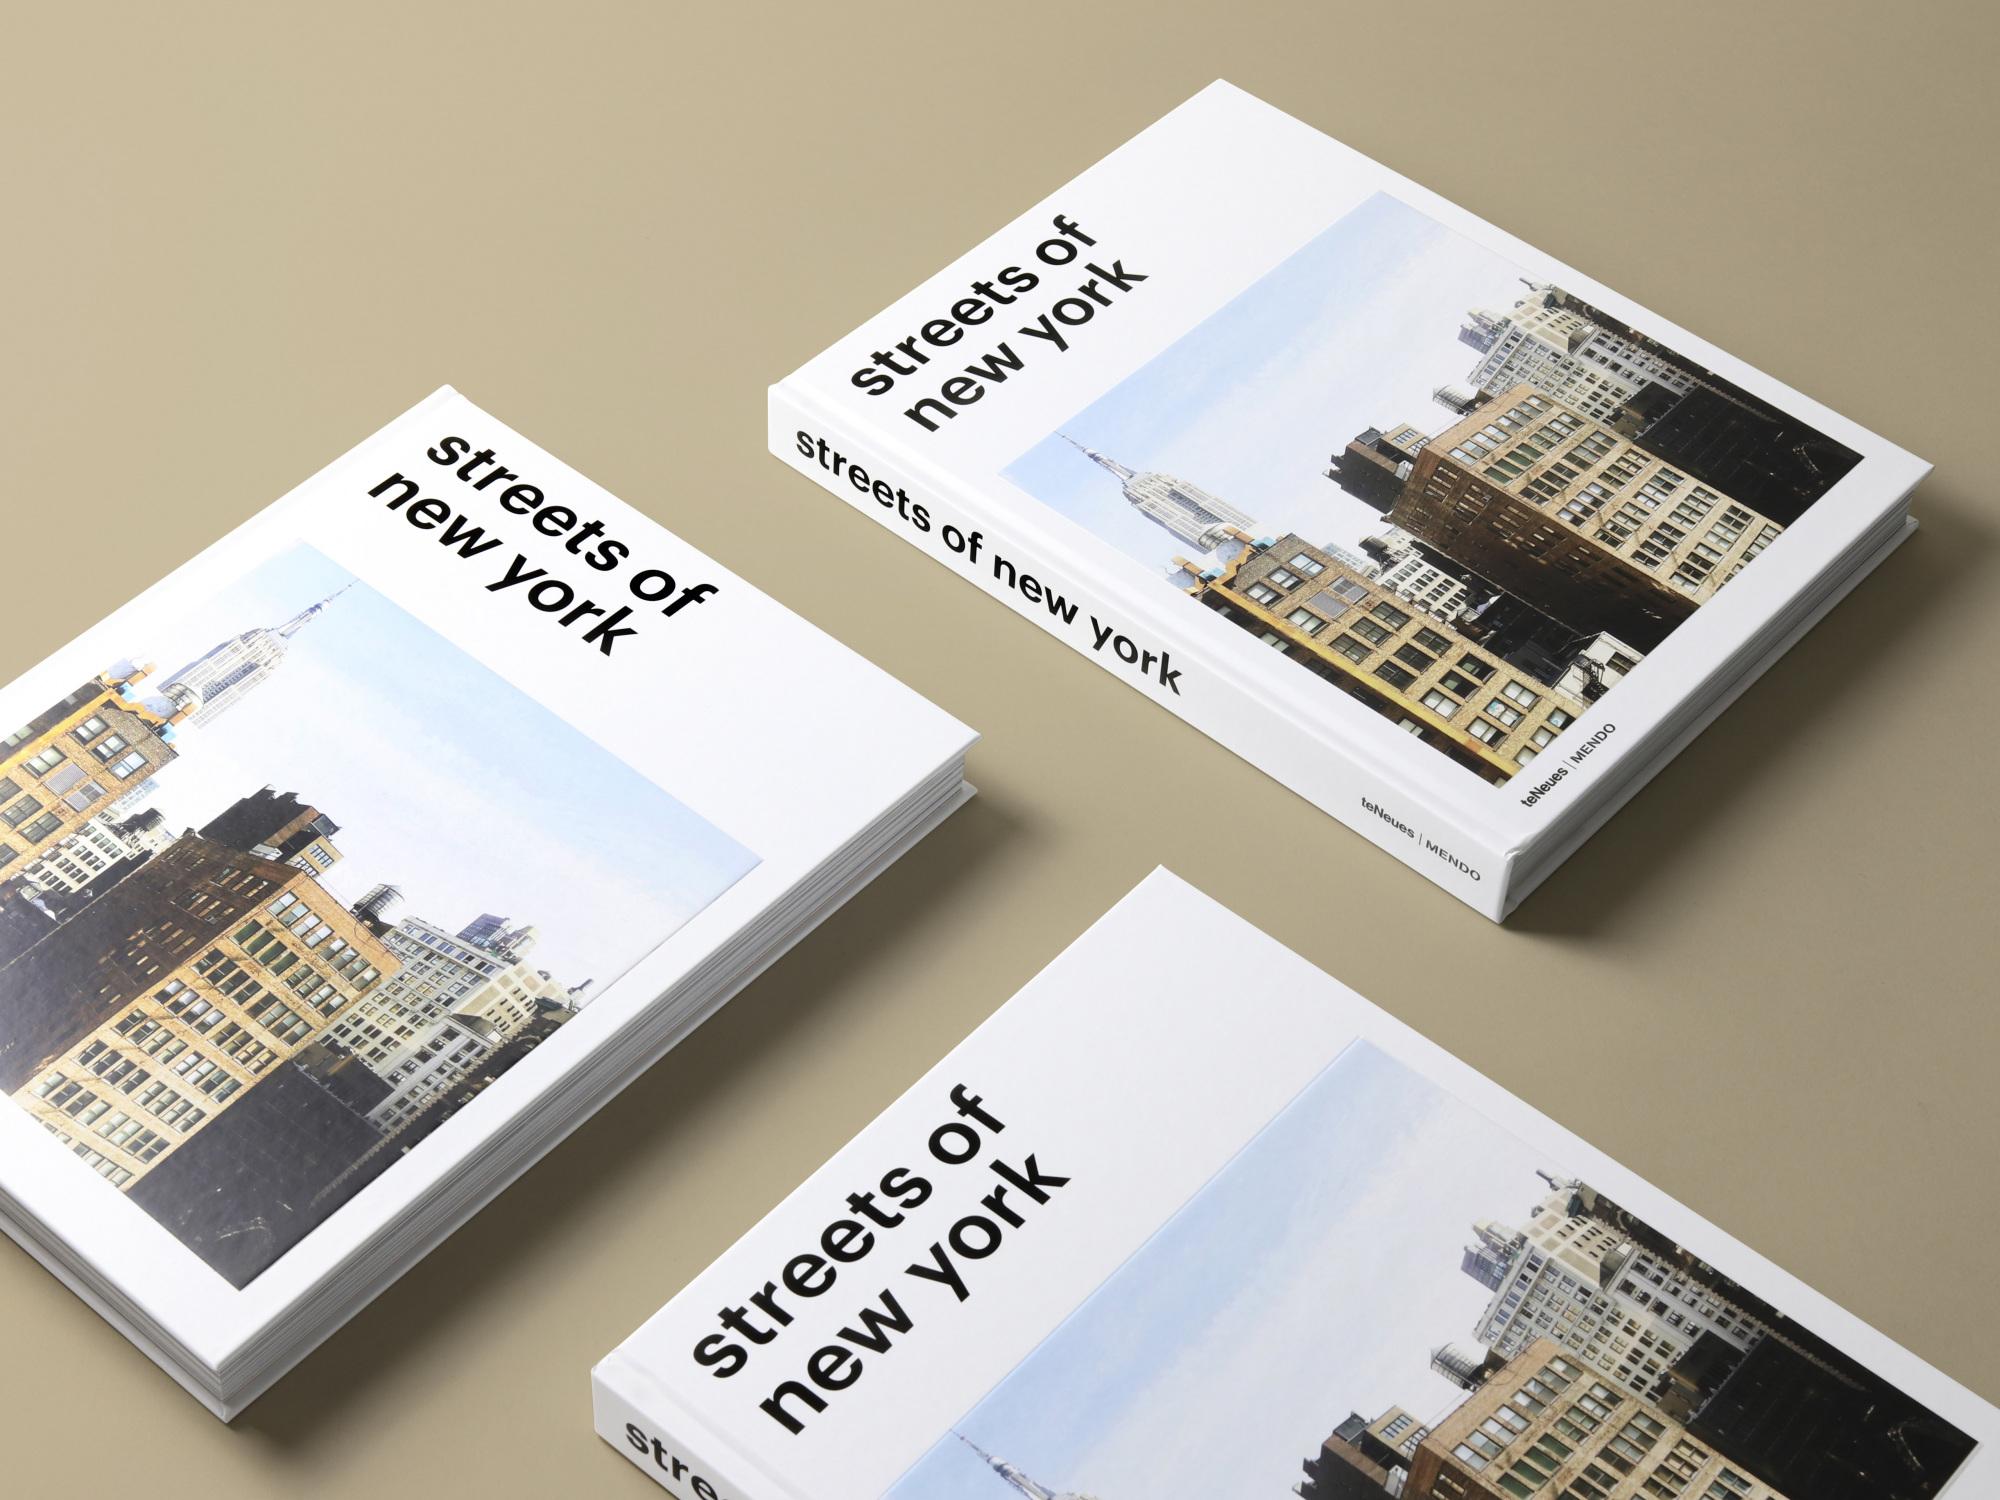 mendo-book-streets-of-new-york-01-2-2000x1500-c-default (1).jpg